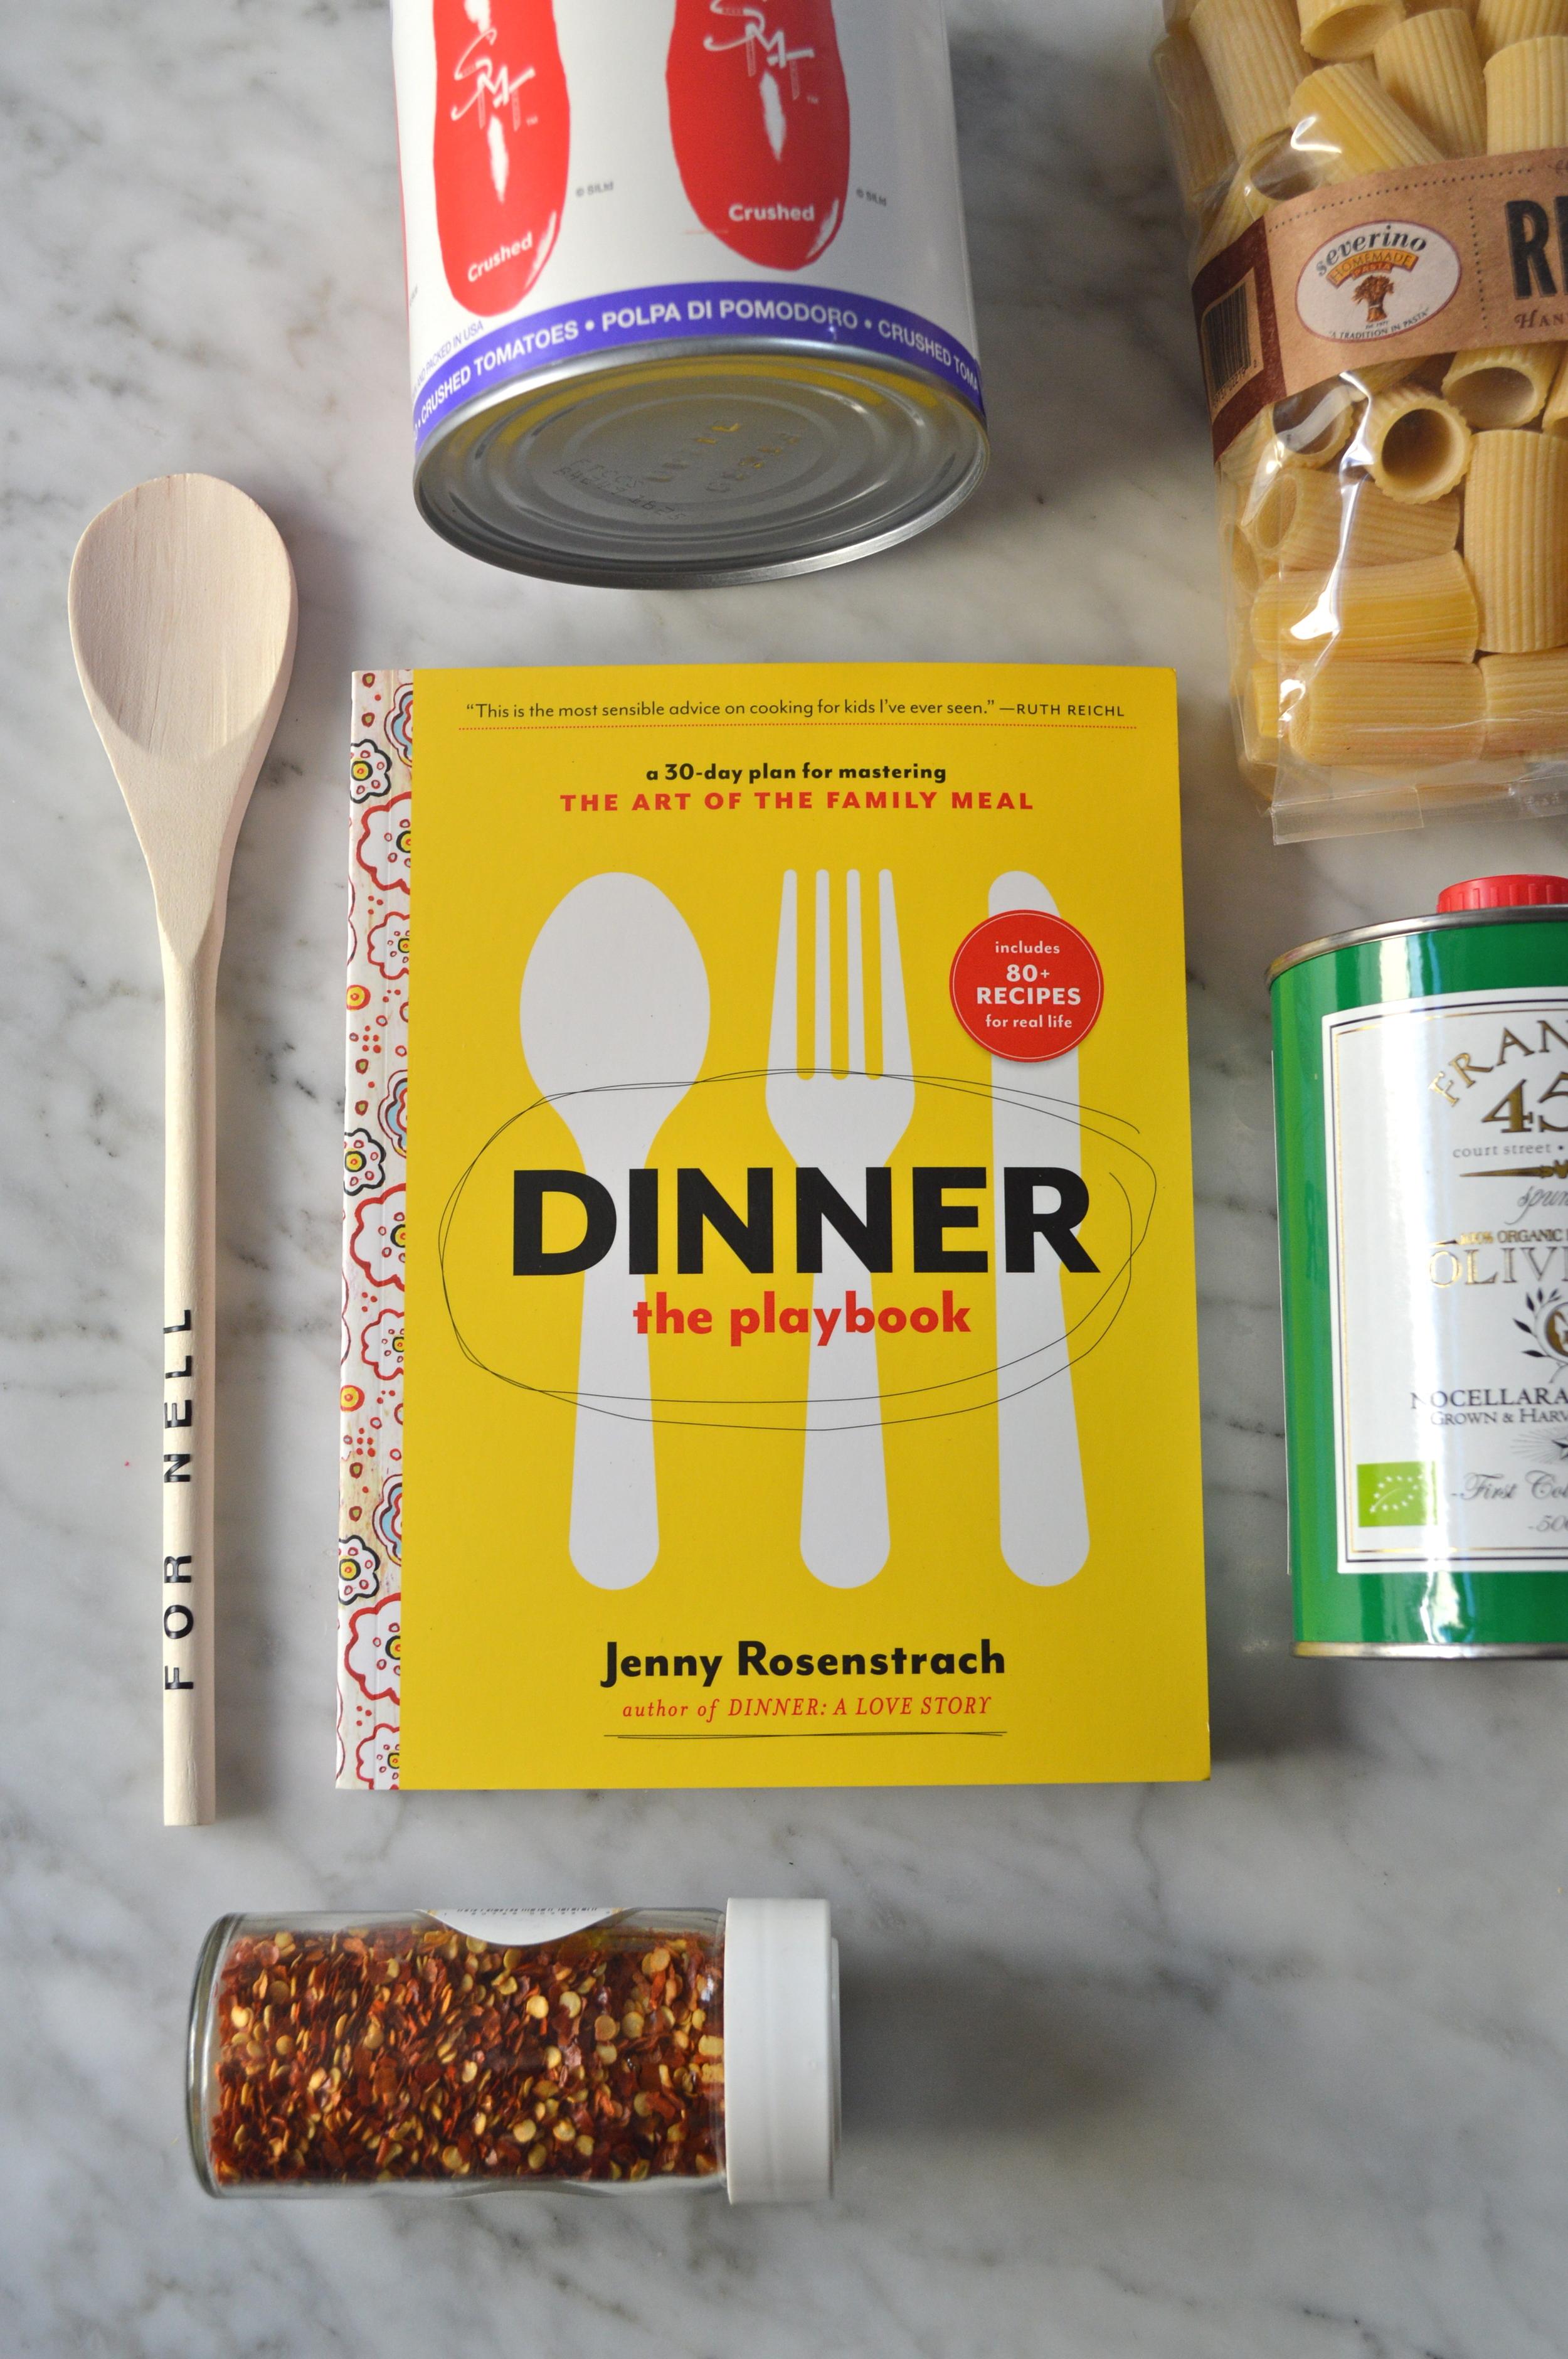 Dinner-a-Playbook-Gift-Kit-ingredients